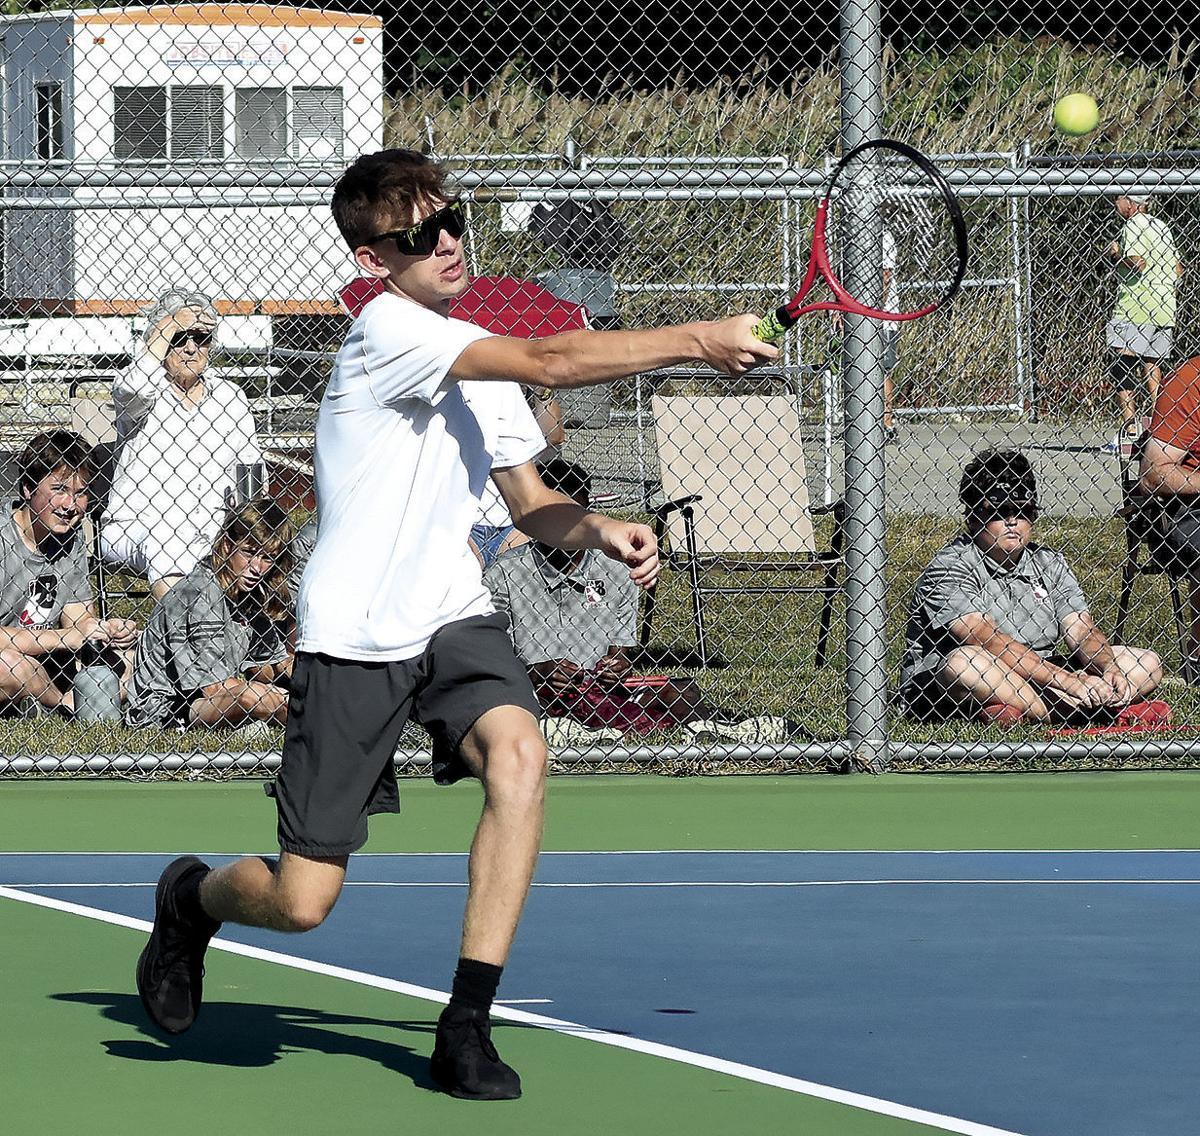 9 23 Sports Tennis 3 Sunglasses.jpg